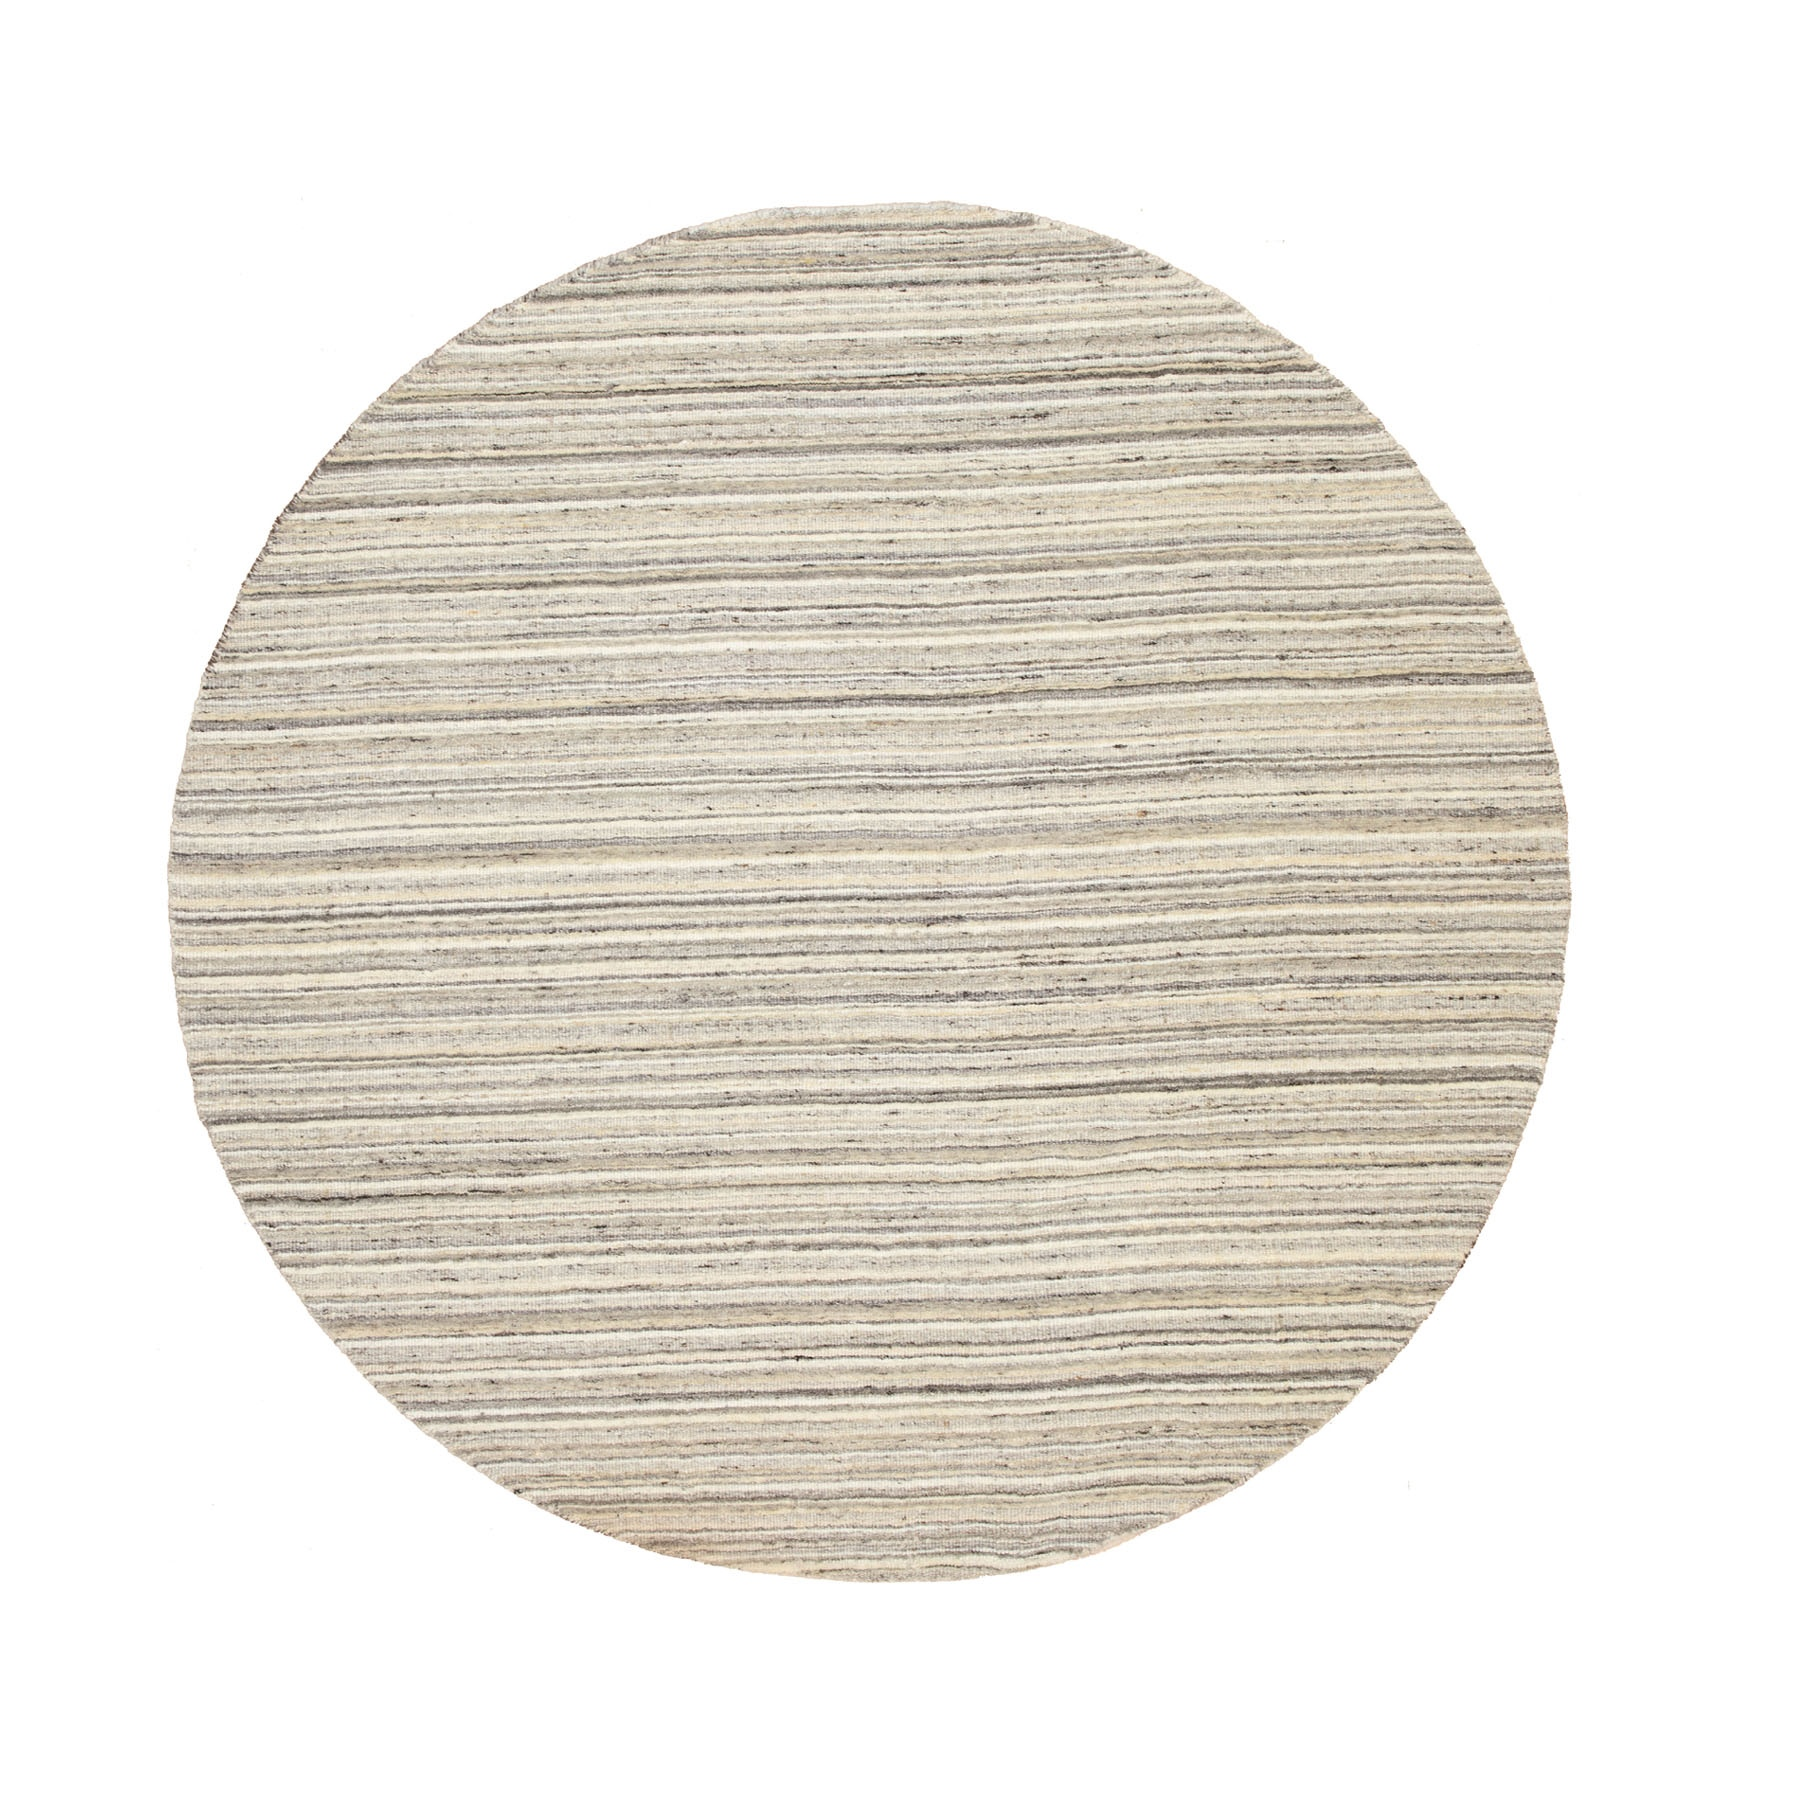 6'X6' Round Beige Hand Loomed Natural Wool Plain Modern Oriental Rug moae8c69